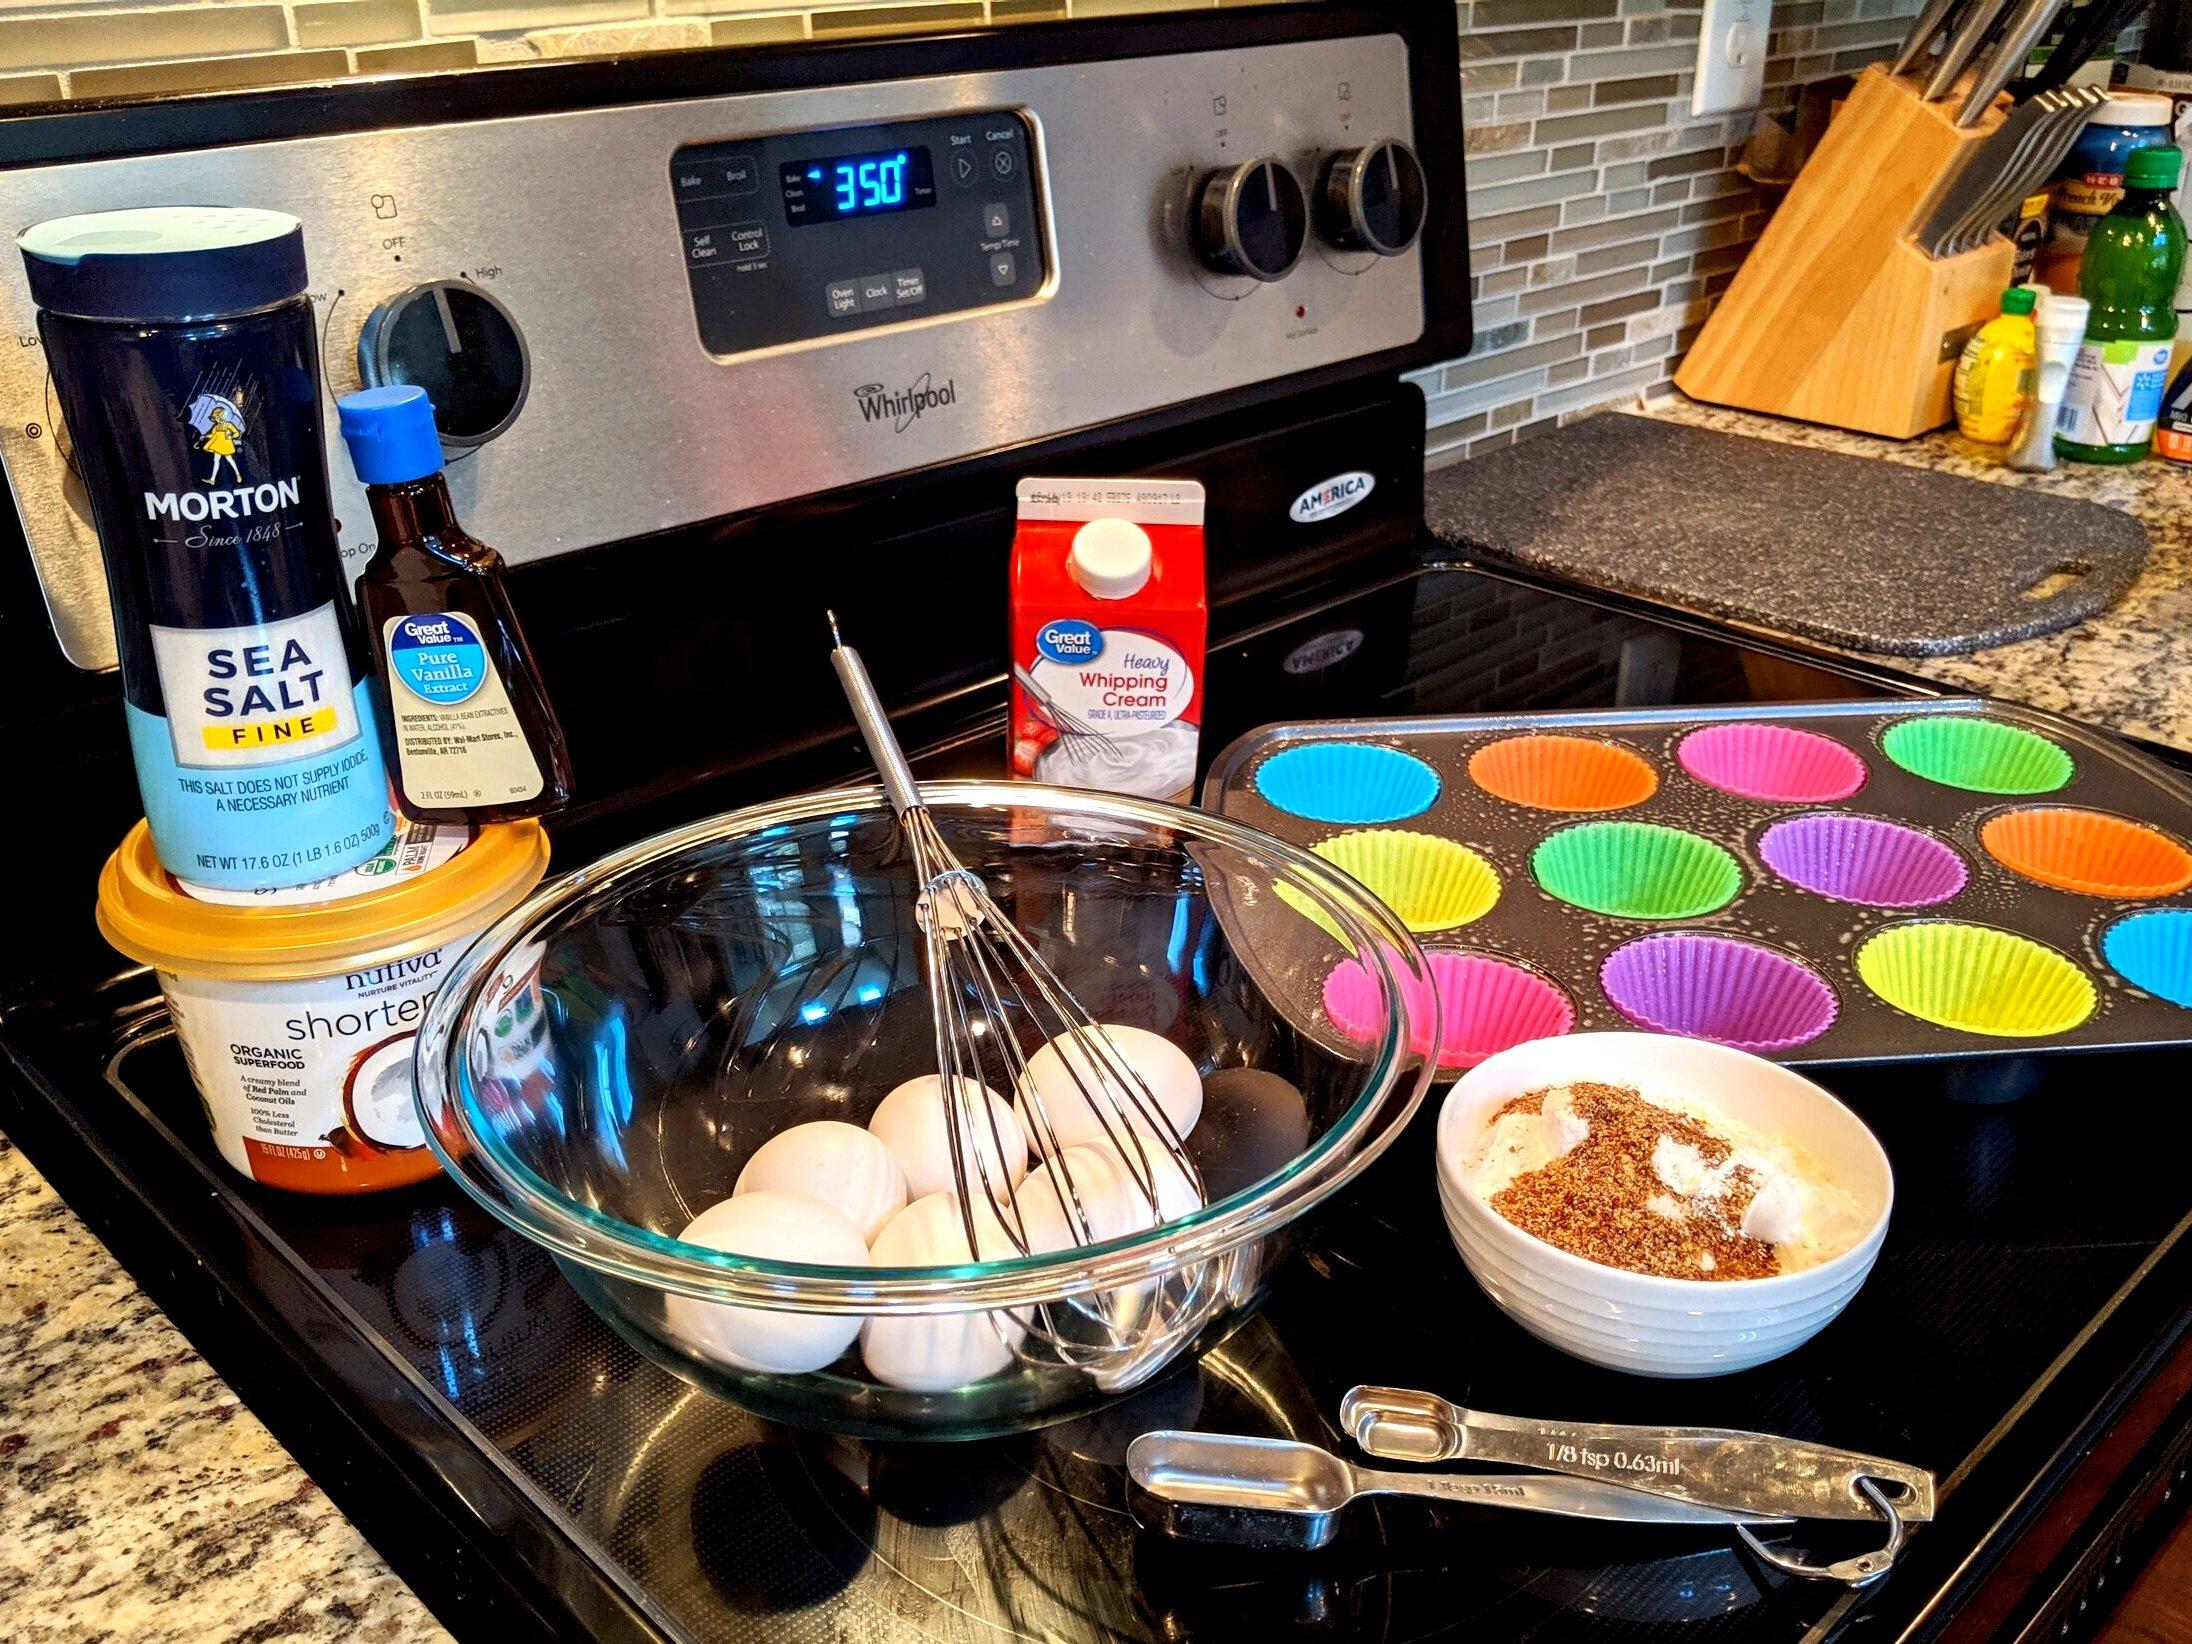 ChipMonk+Baking+Keto+Gluten+Free+Vanilla+Cupcakes+%281%29.jpg